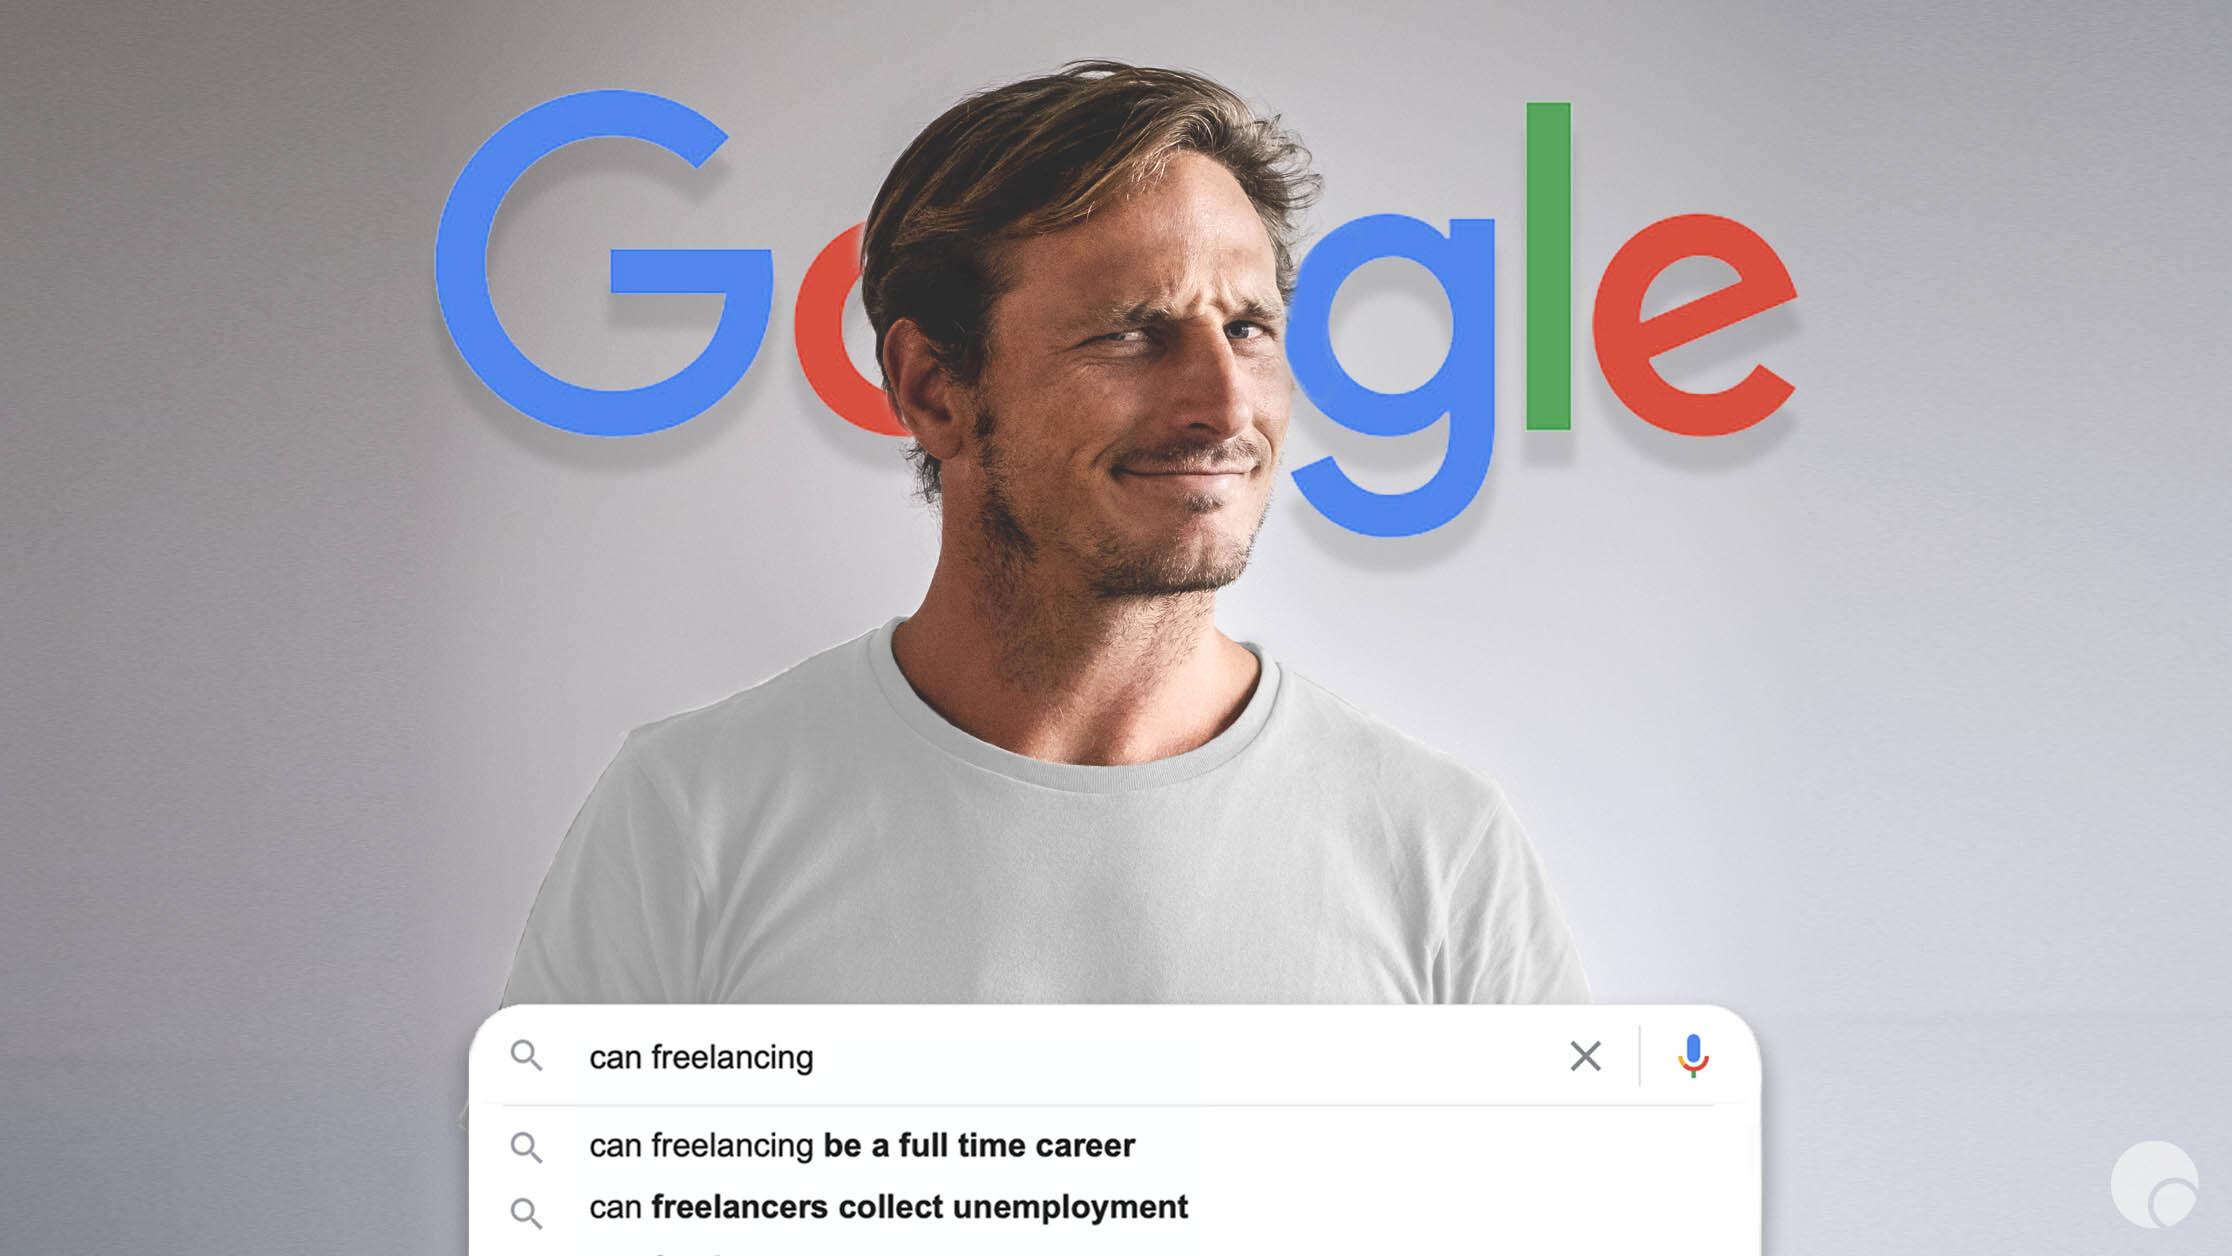 Jason-Freelancing-Google-Autocomplete